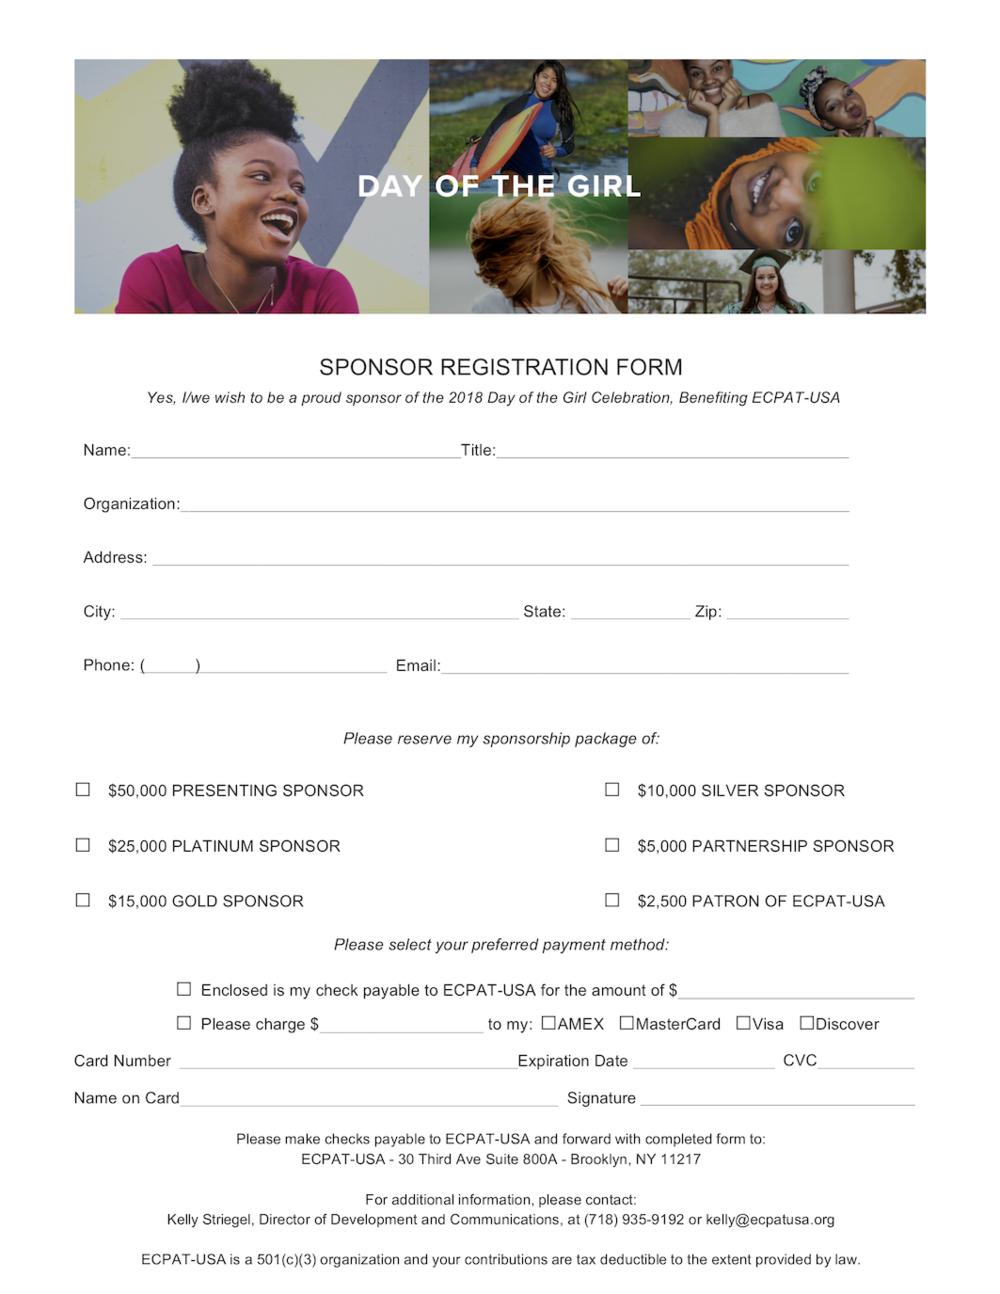 SponsorshipForm_DayOfTheGirl.png